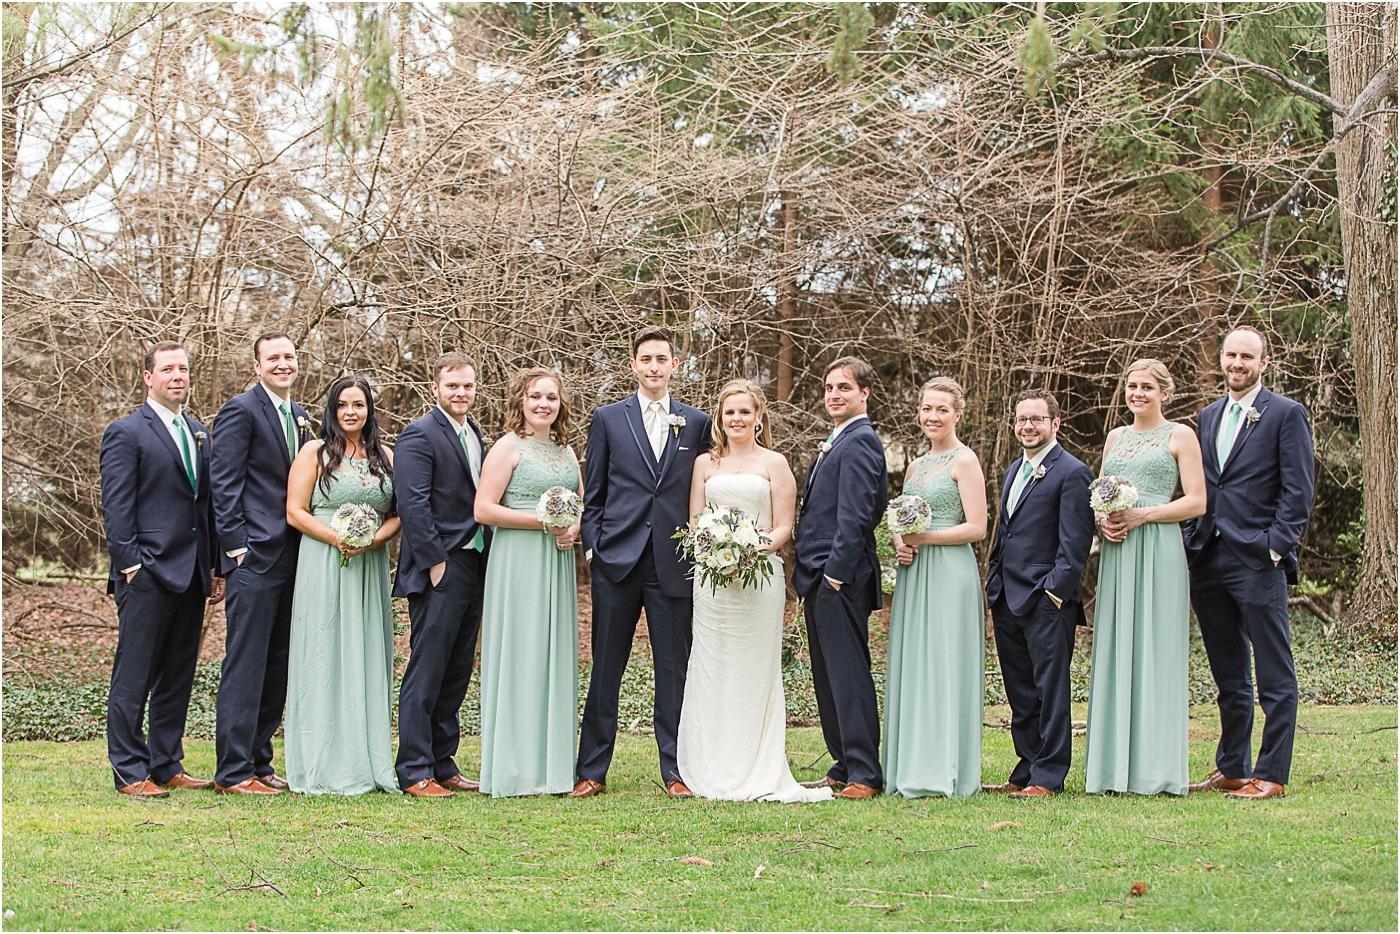 Greyrock-mansion-wedding-65.jpg